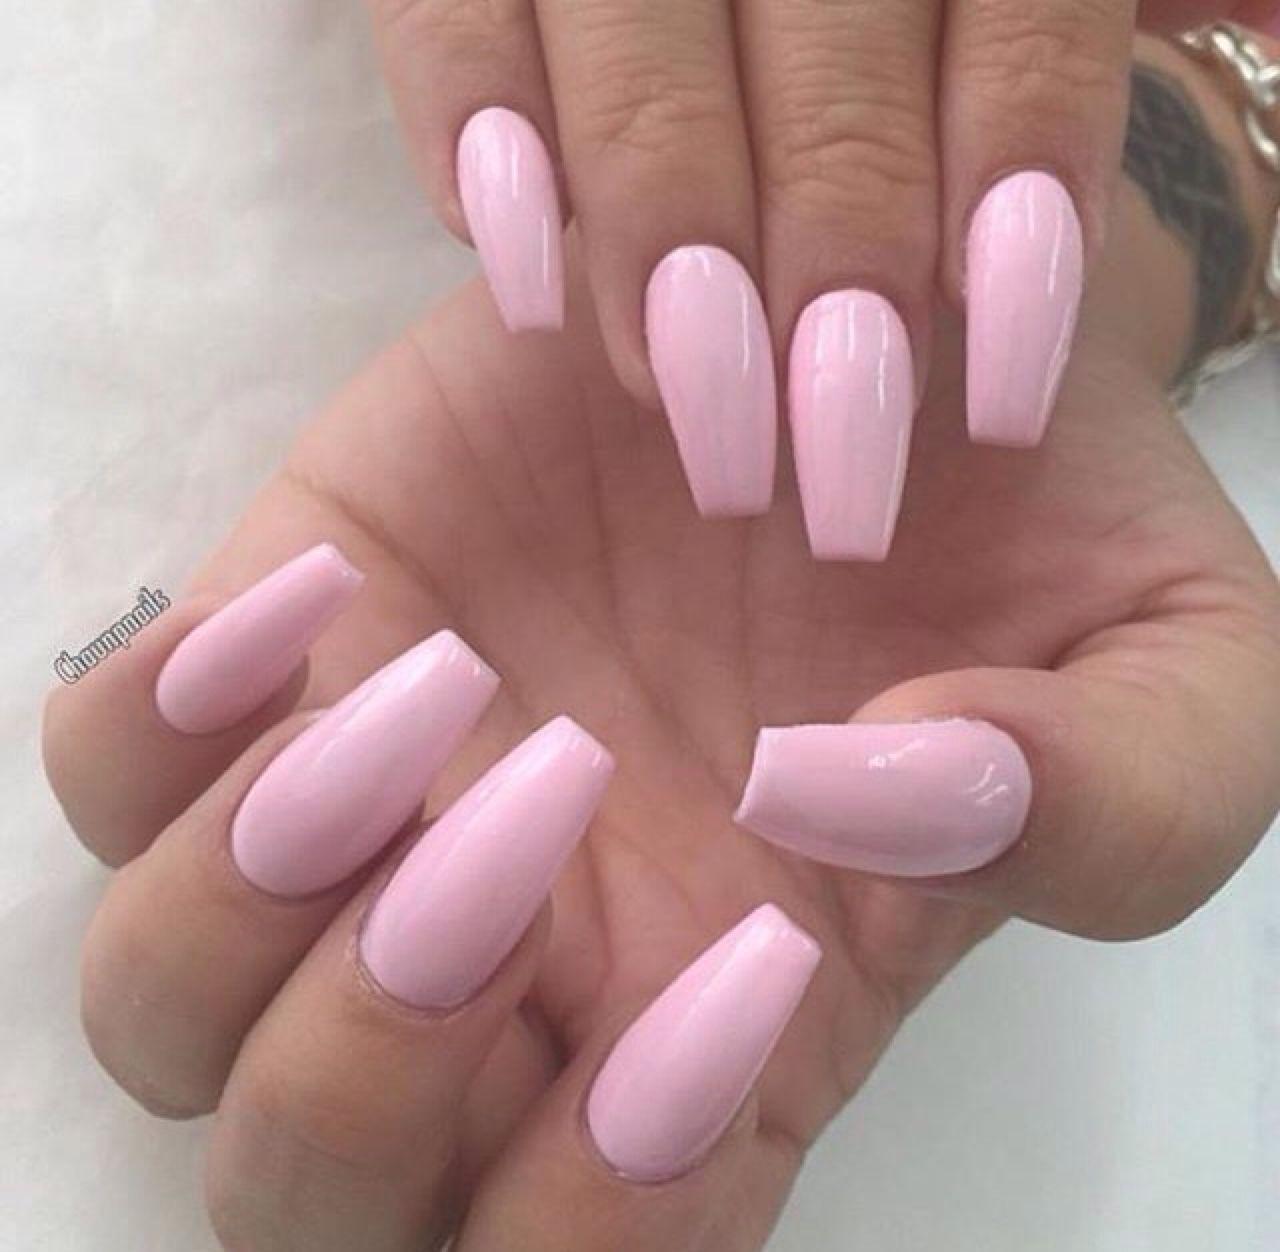 Znalezione Obrazy Dla Zapytania Acrylic Nails Coffin Shape Baby Pink Nails Pink Nails Trendy Nails